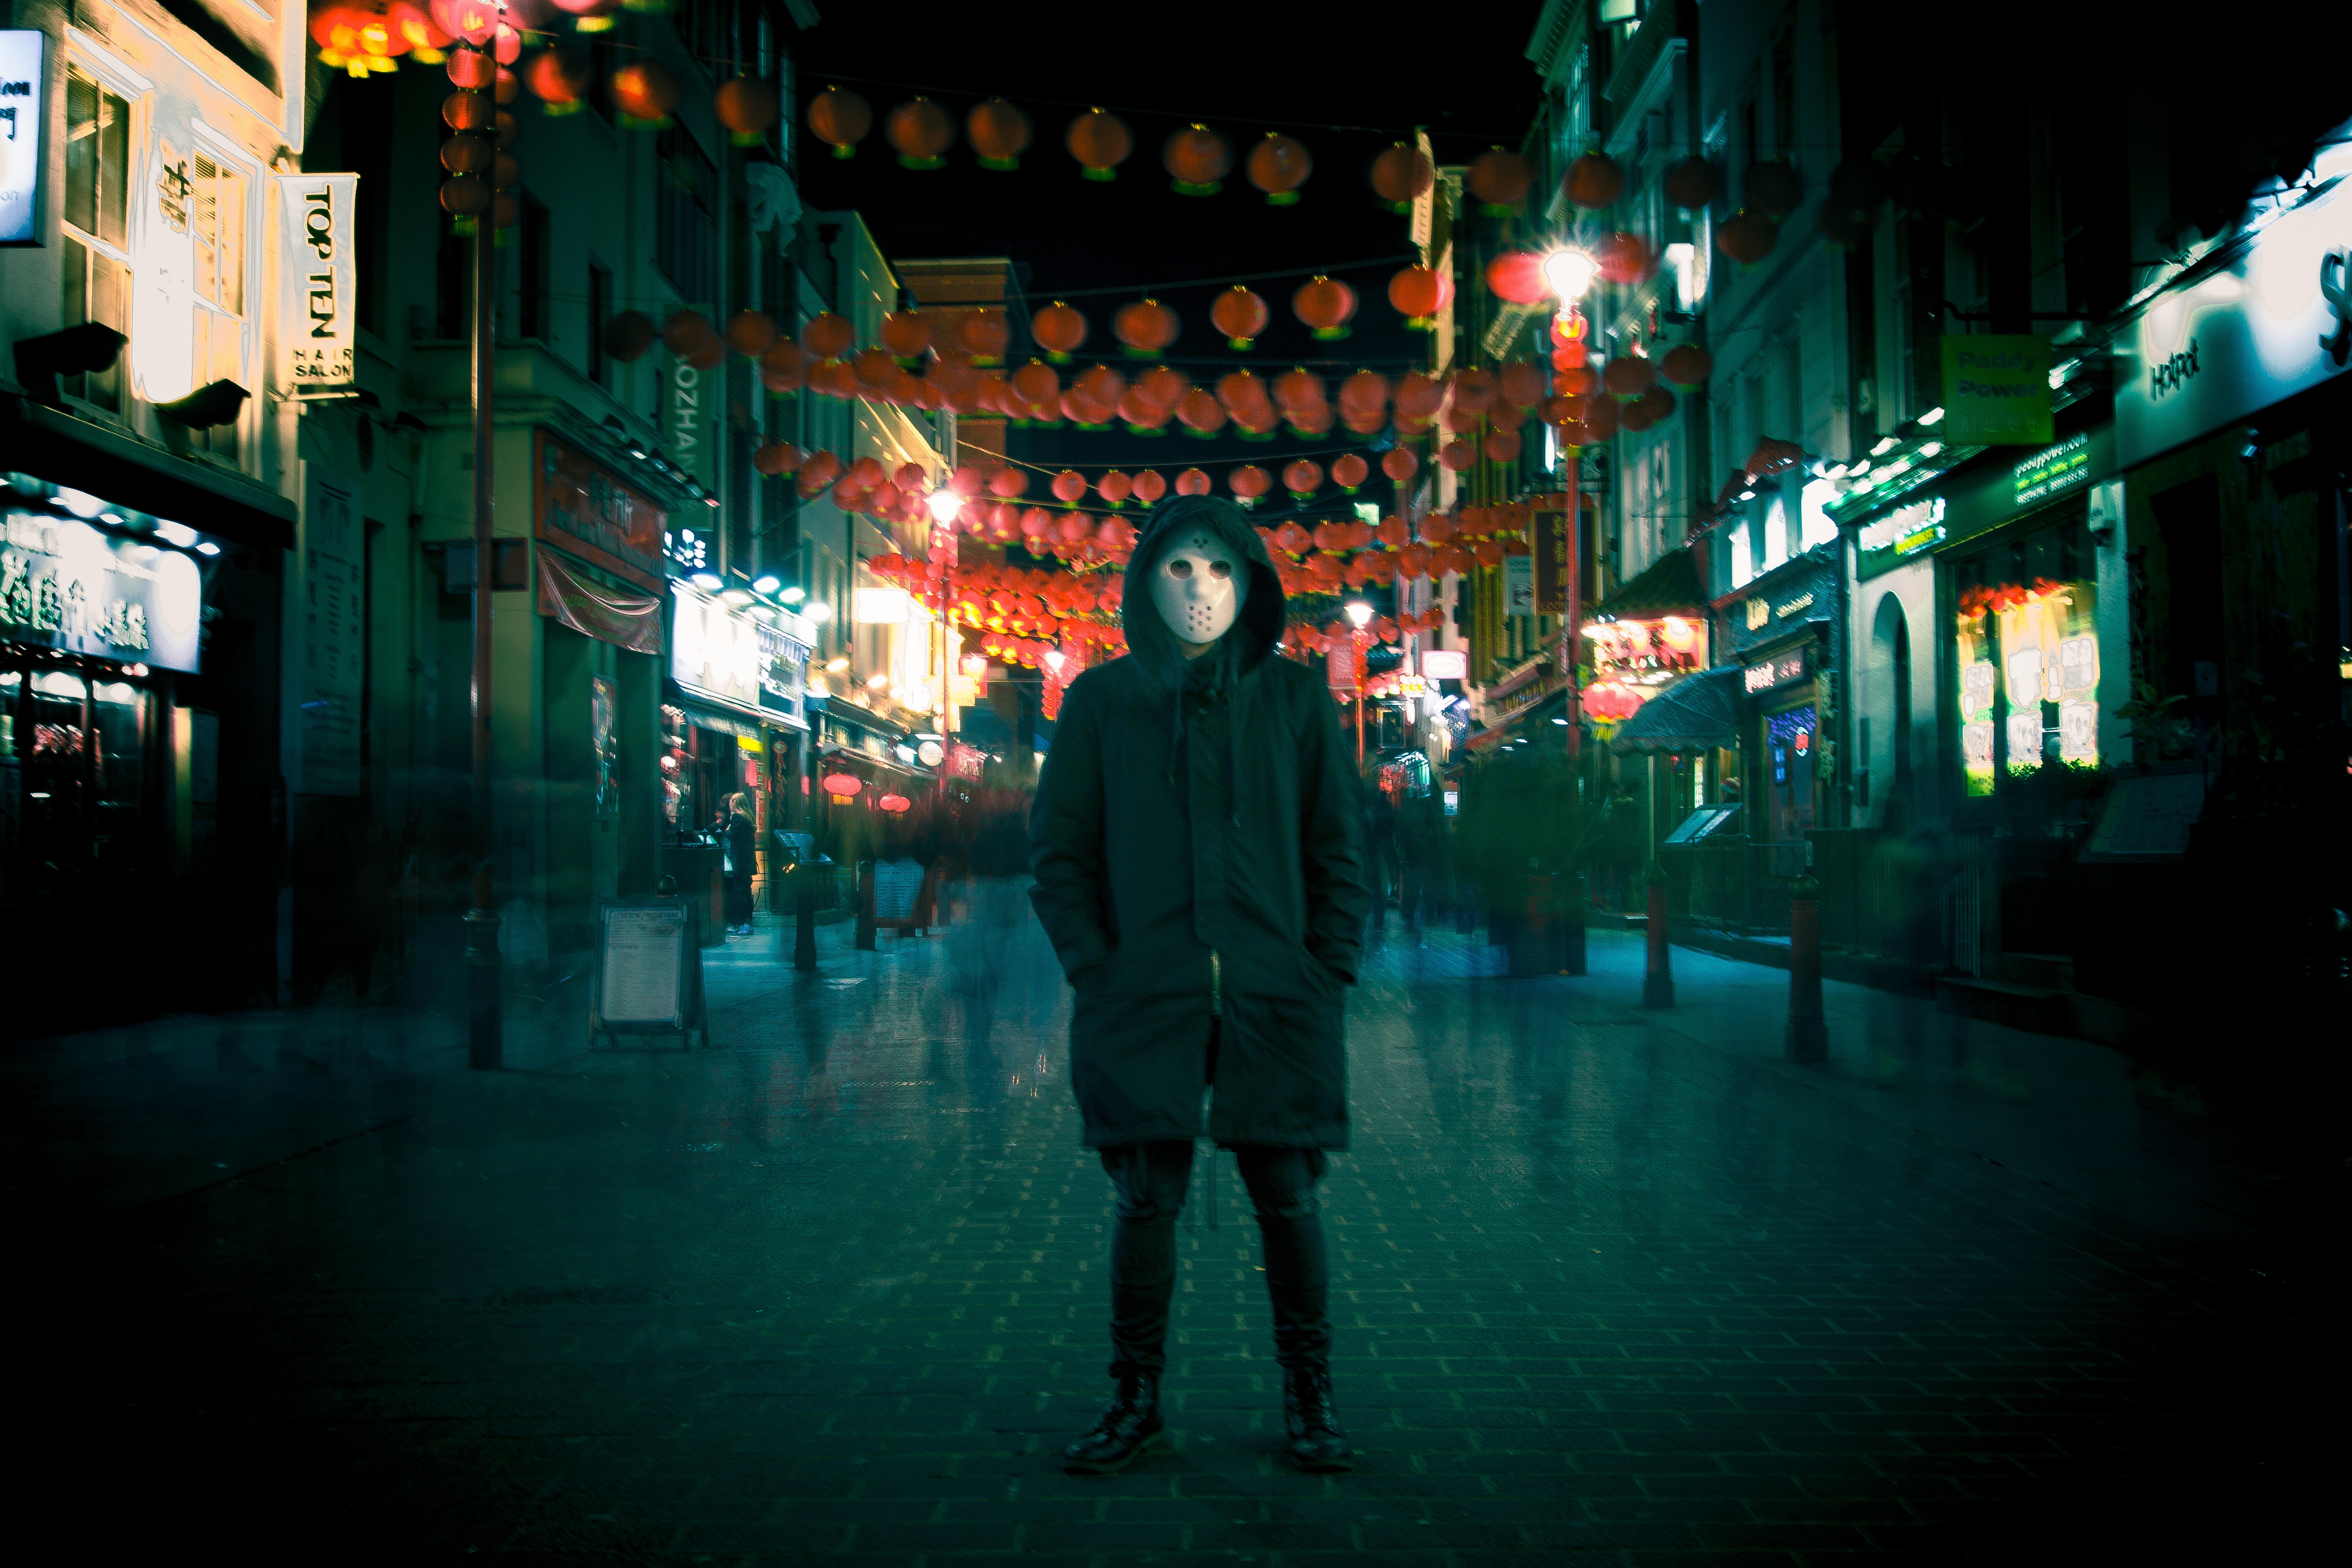 его картинки улицы ночью пацаны онлайн знакомства